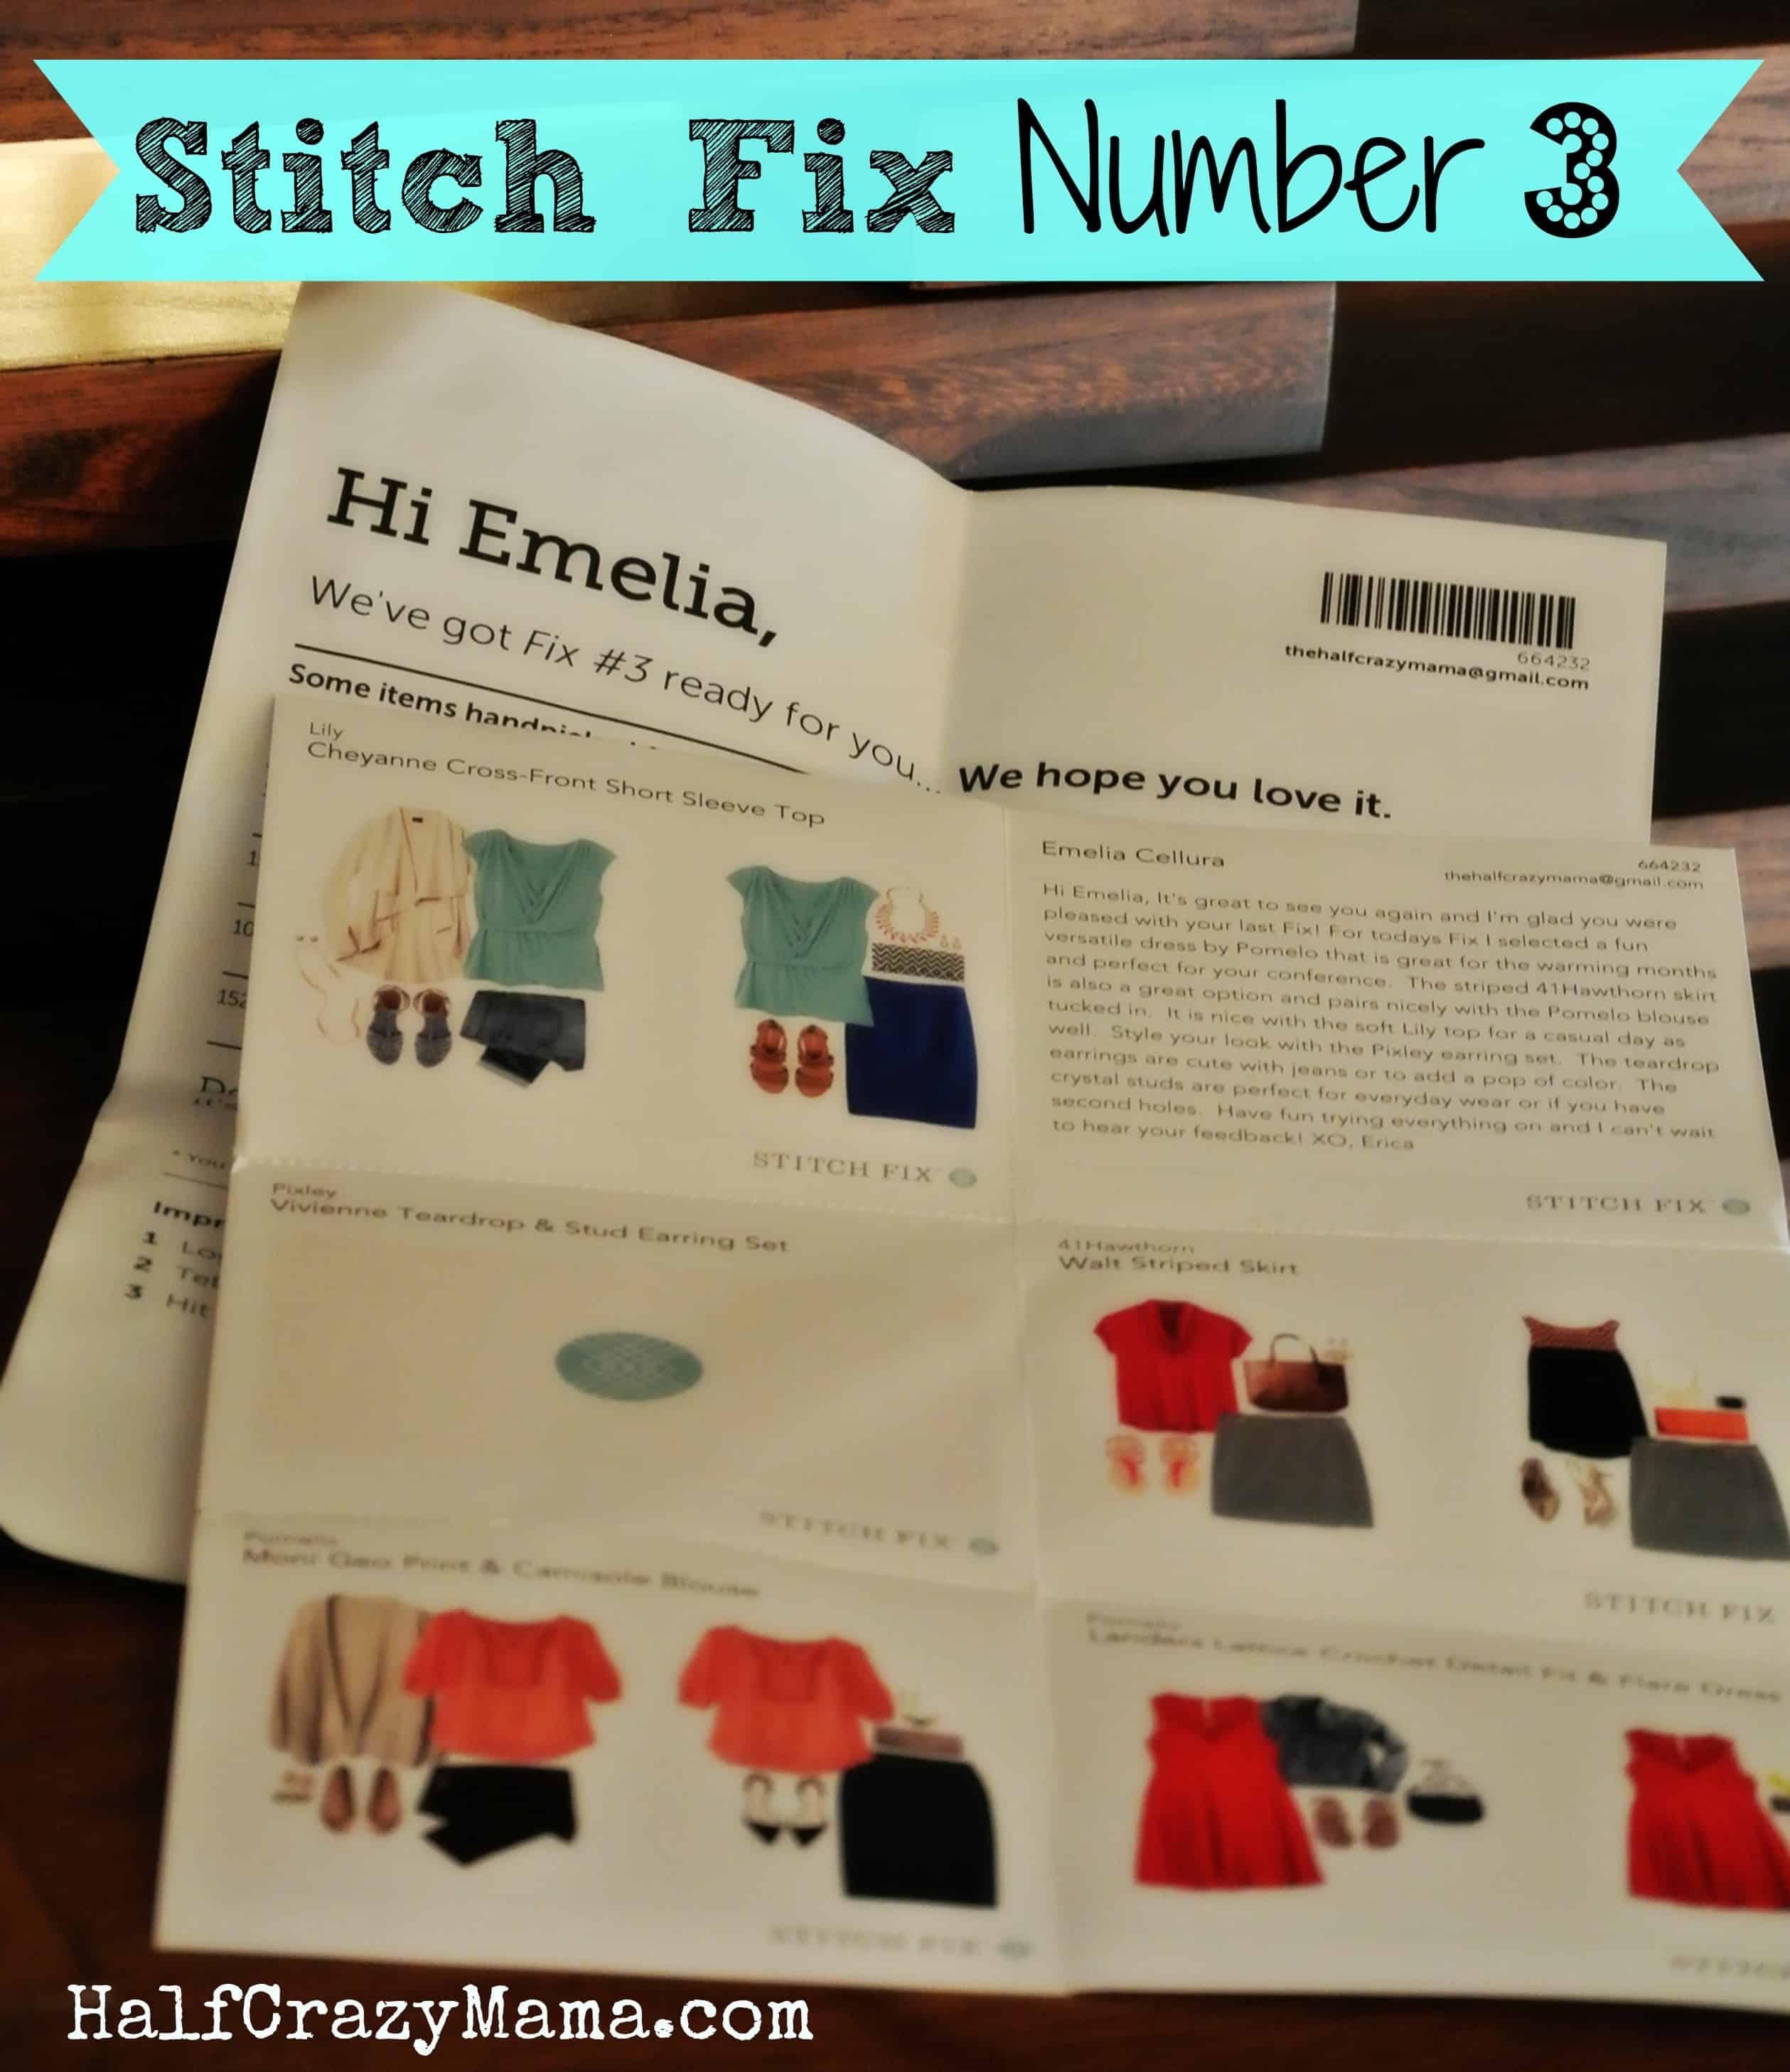 Stitch Fix 3